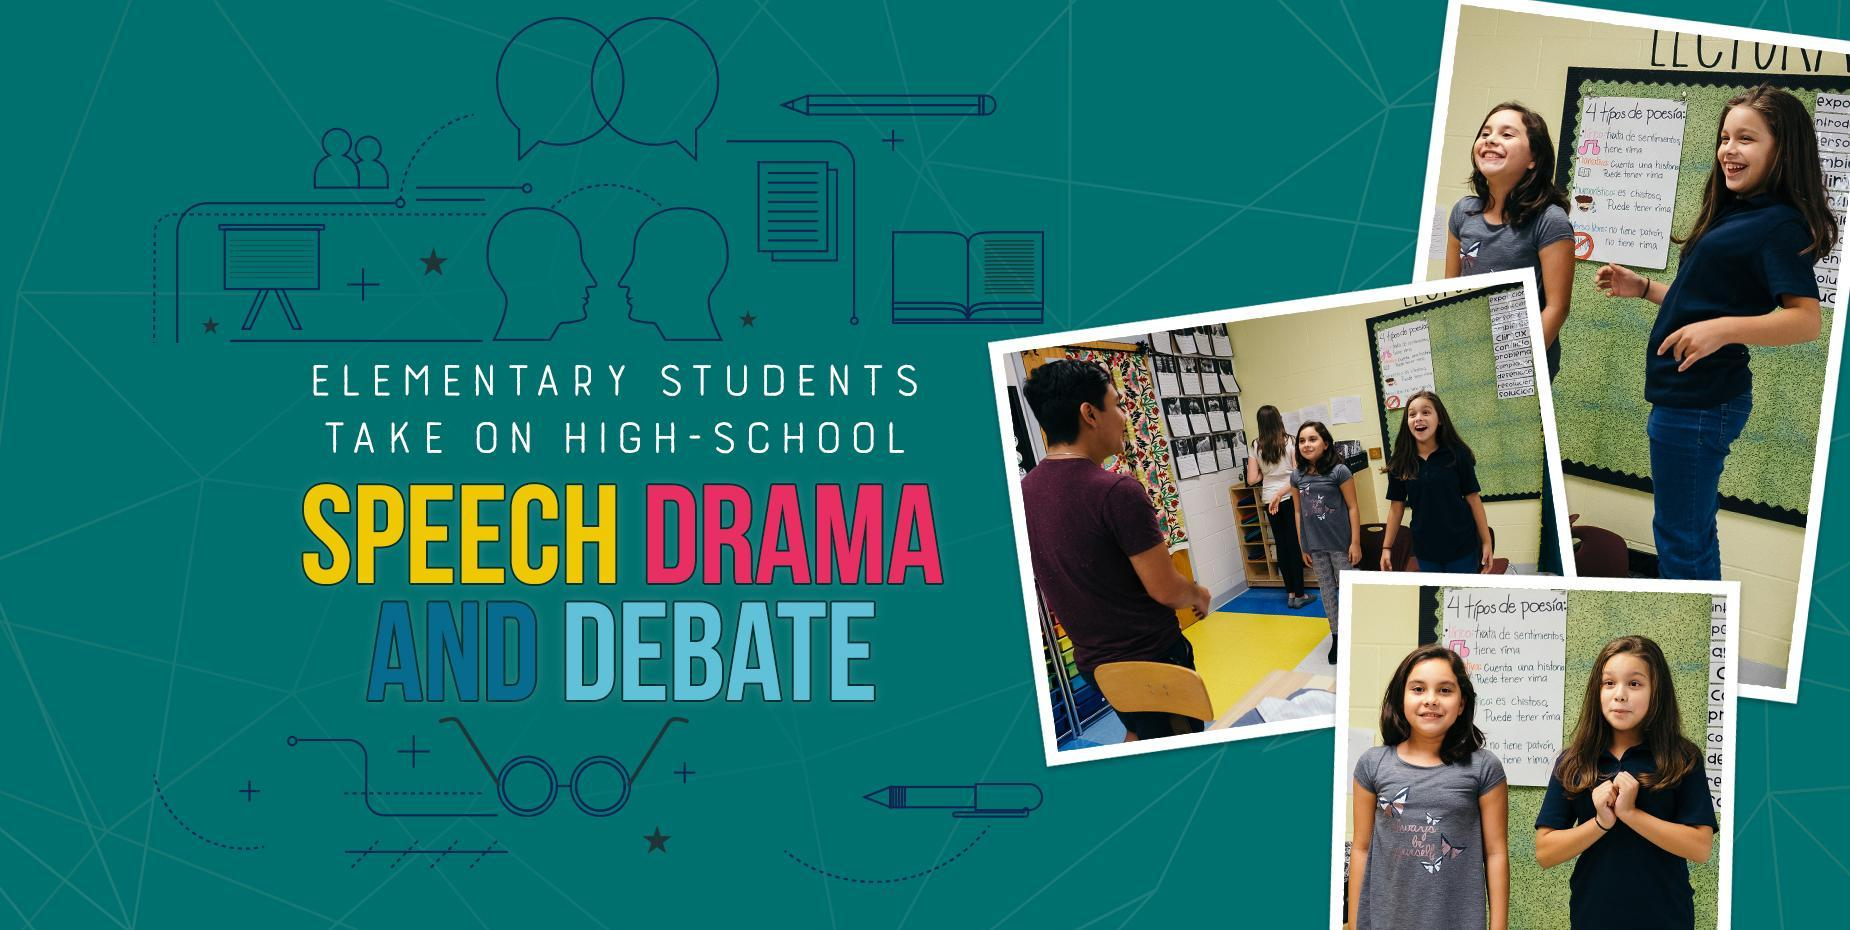 Elementary students take on high-school Speech Drama and Debate